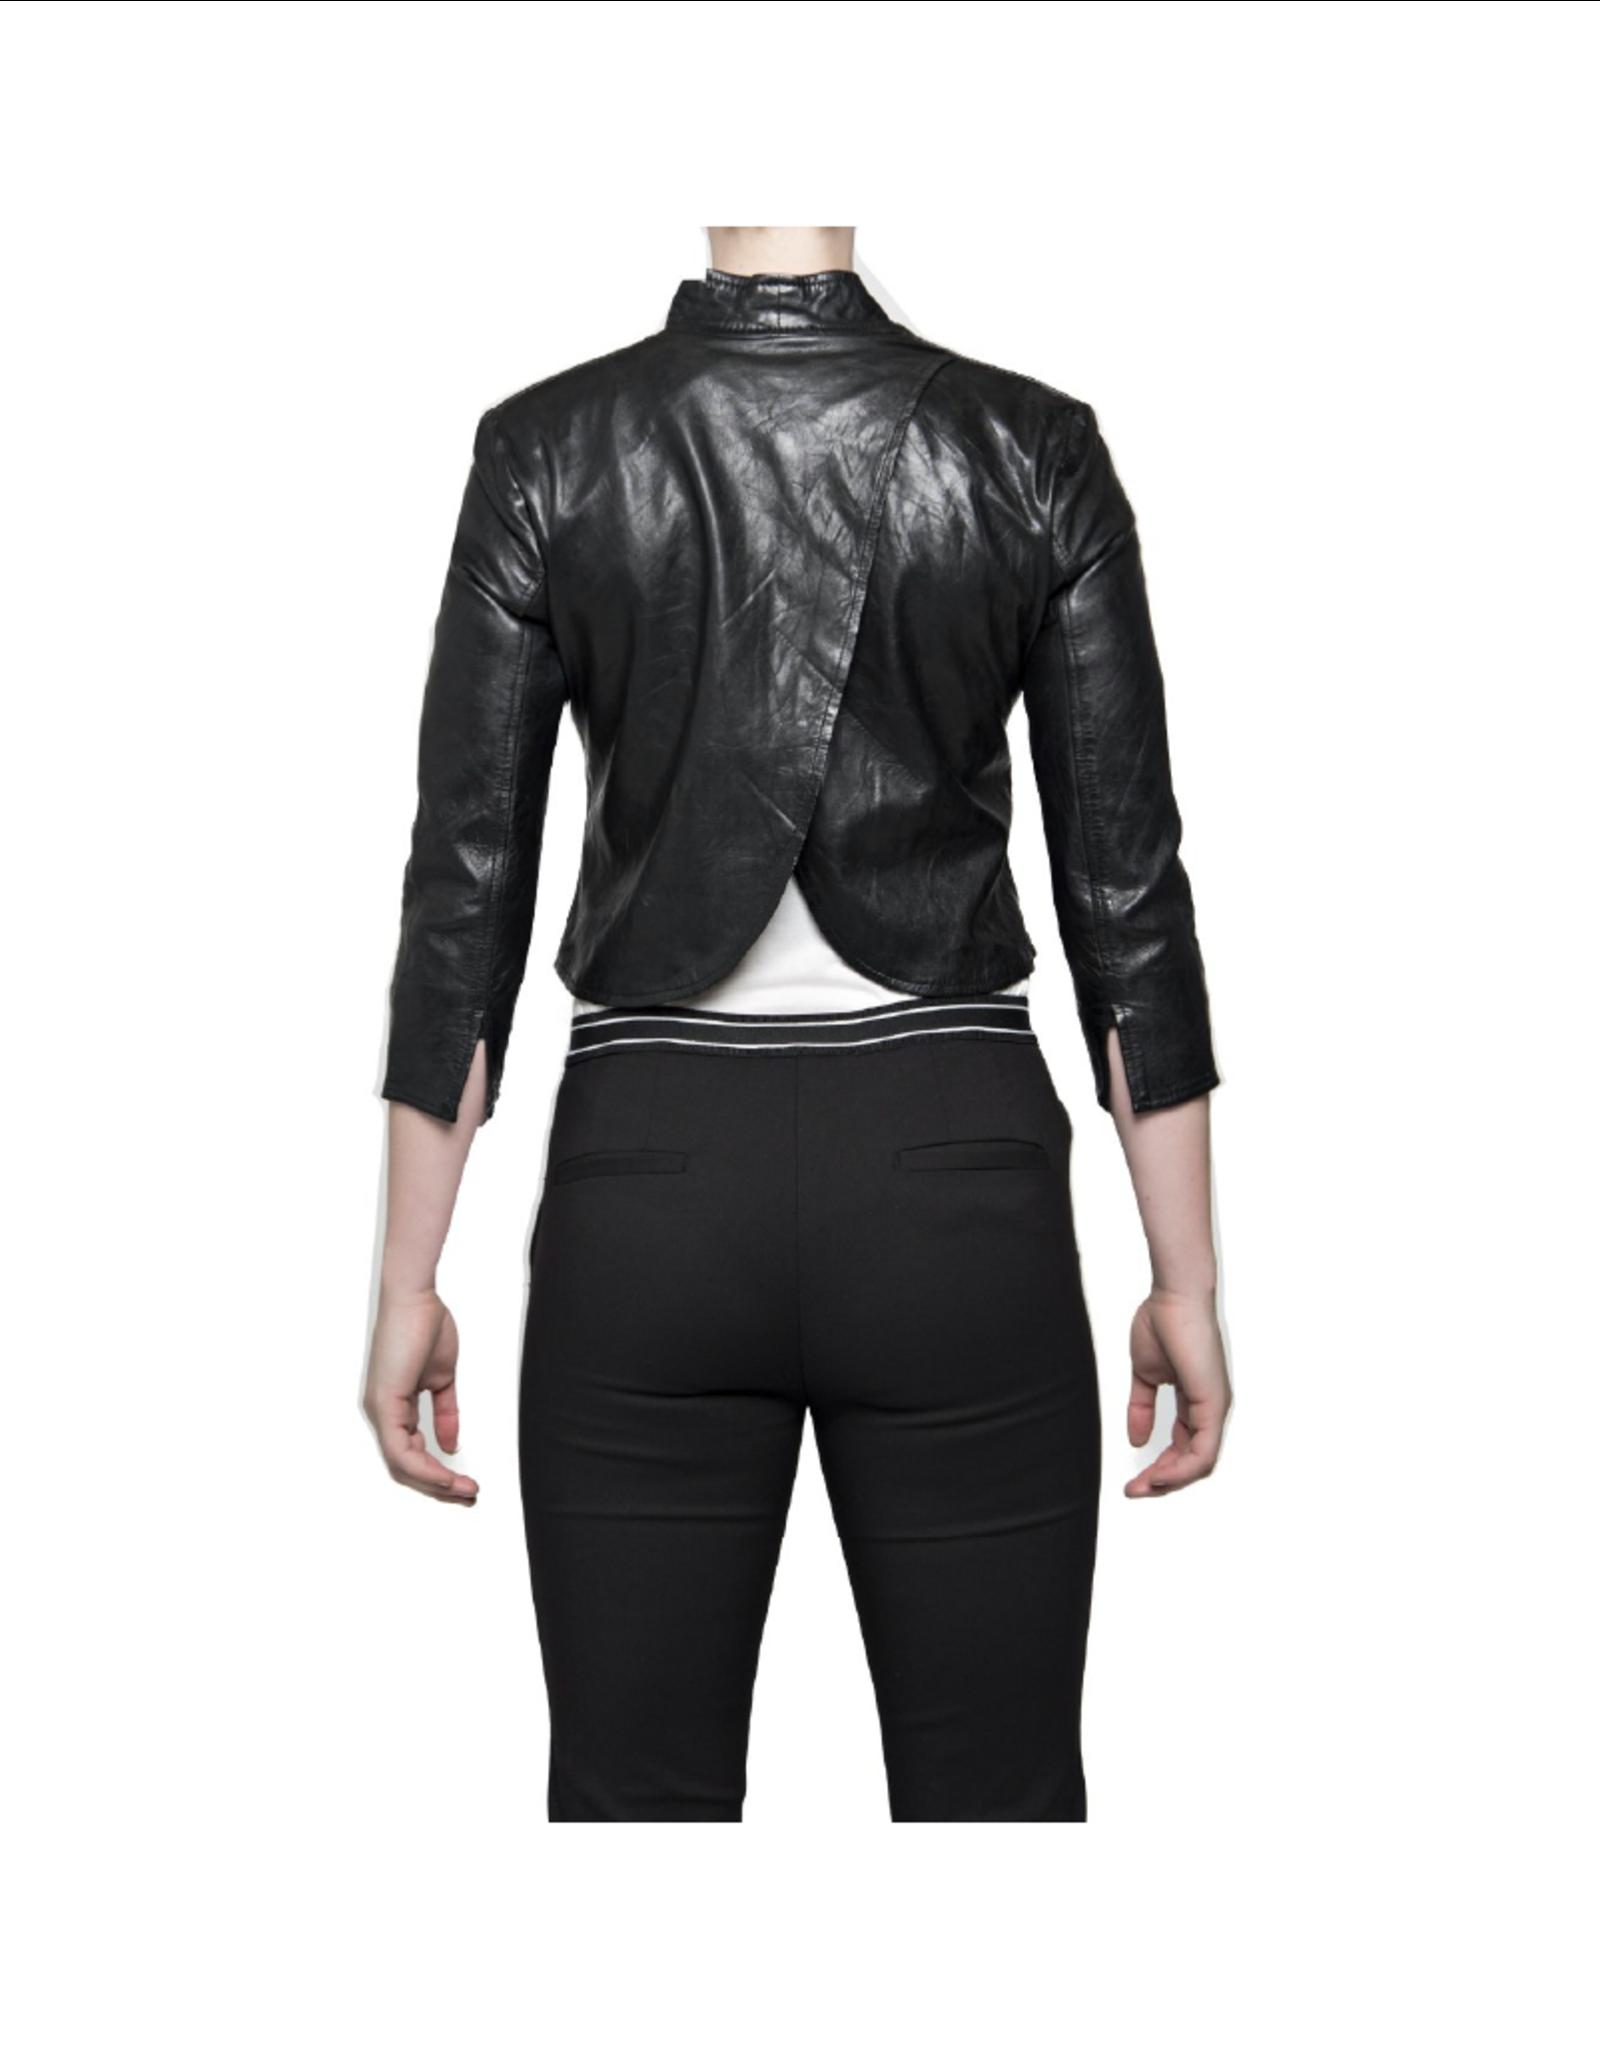 Bano eeMee Vienna Scallop Back Leather Jacket